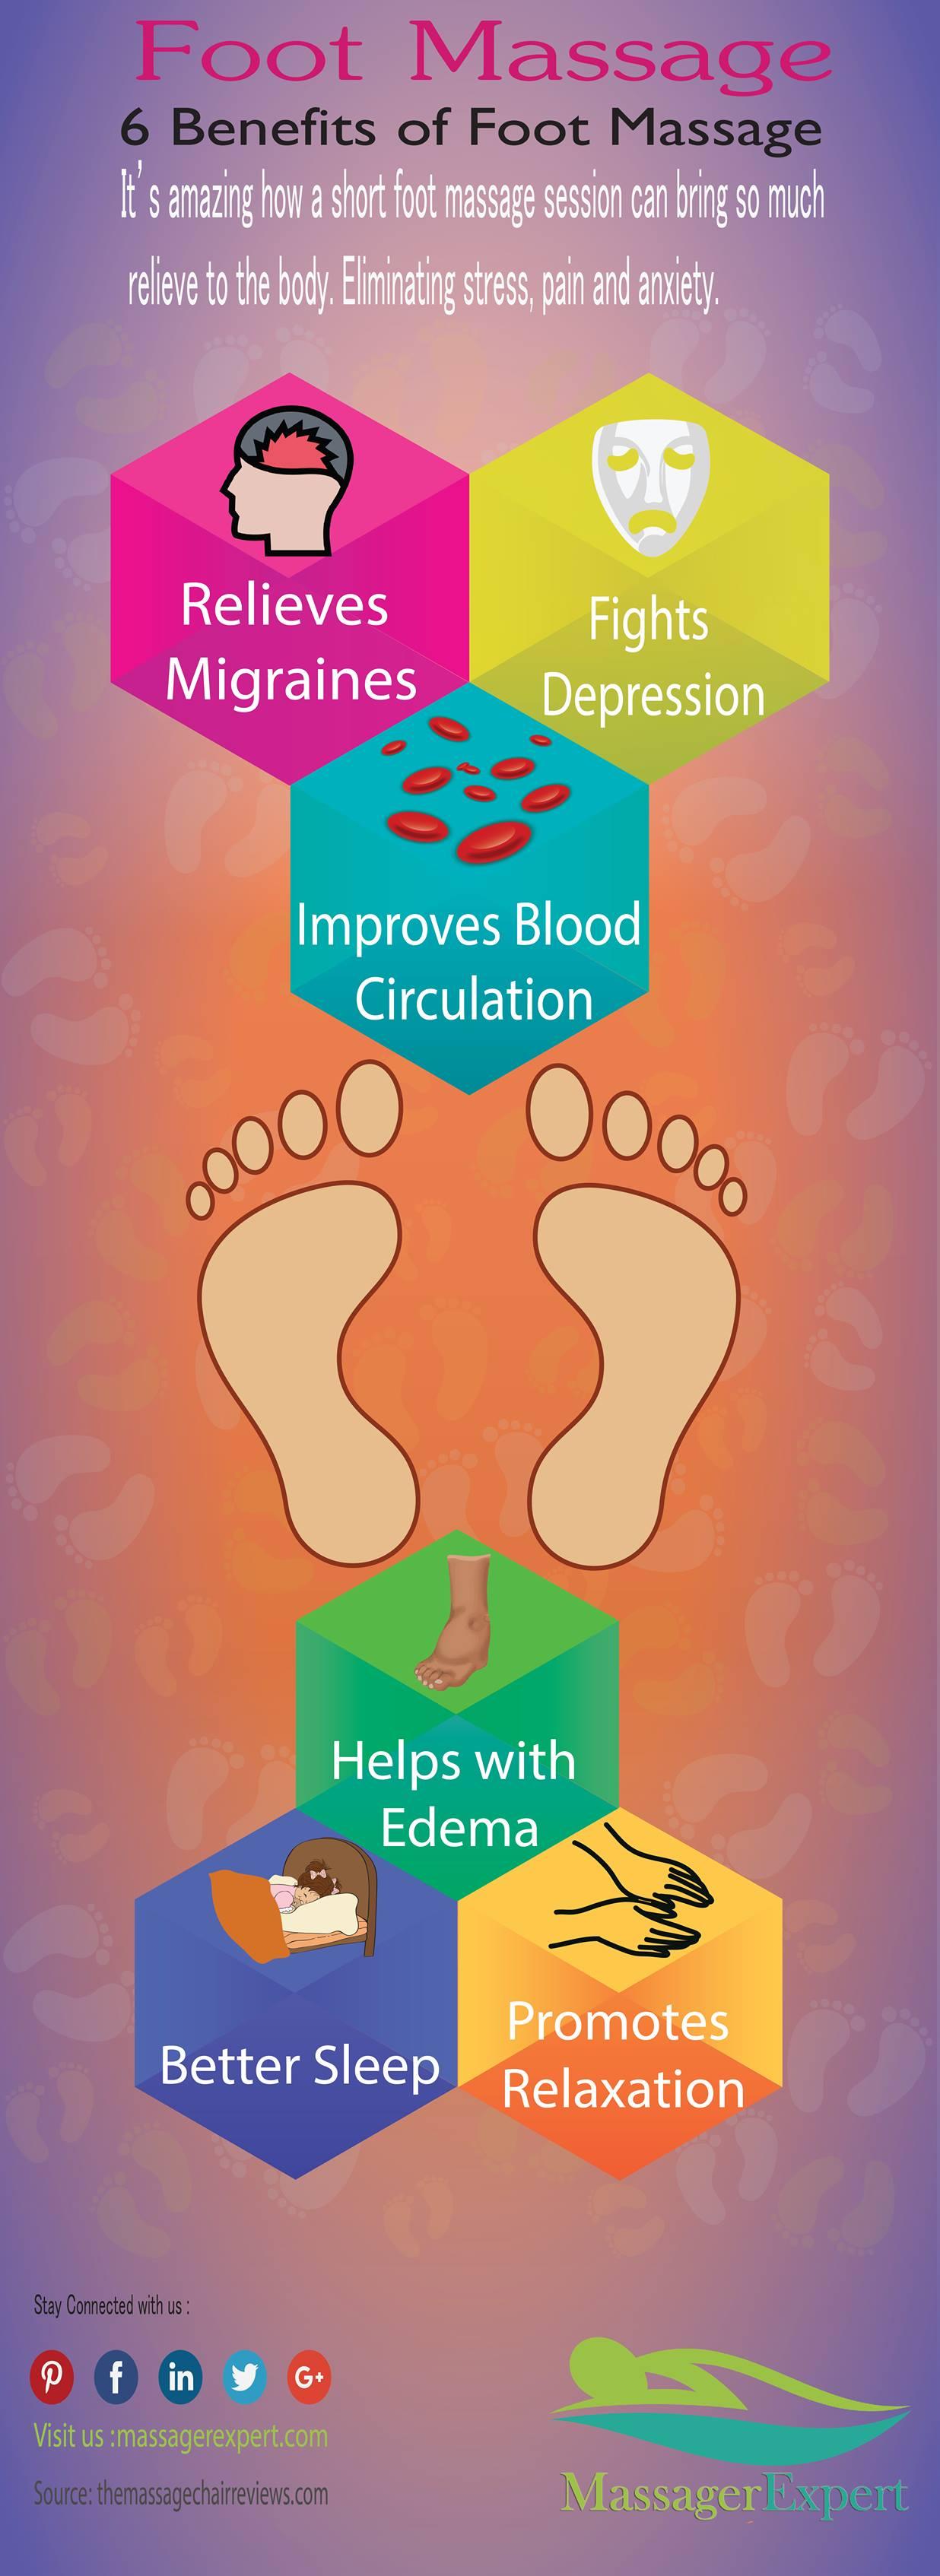 Benefits of Foot Massage [Info graphic]